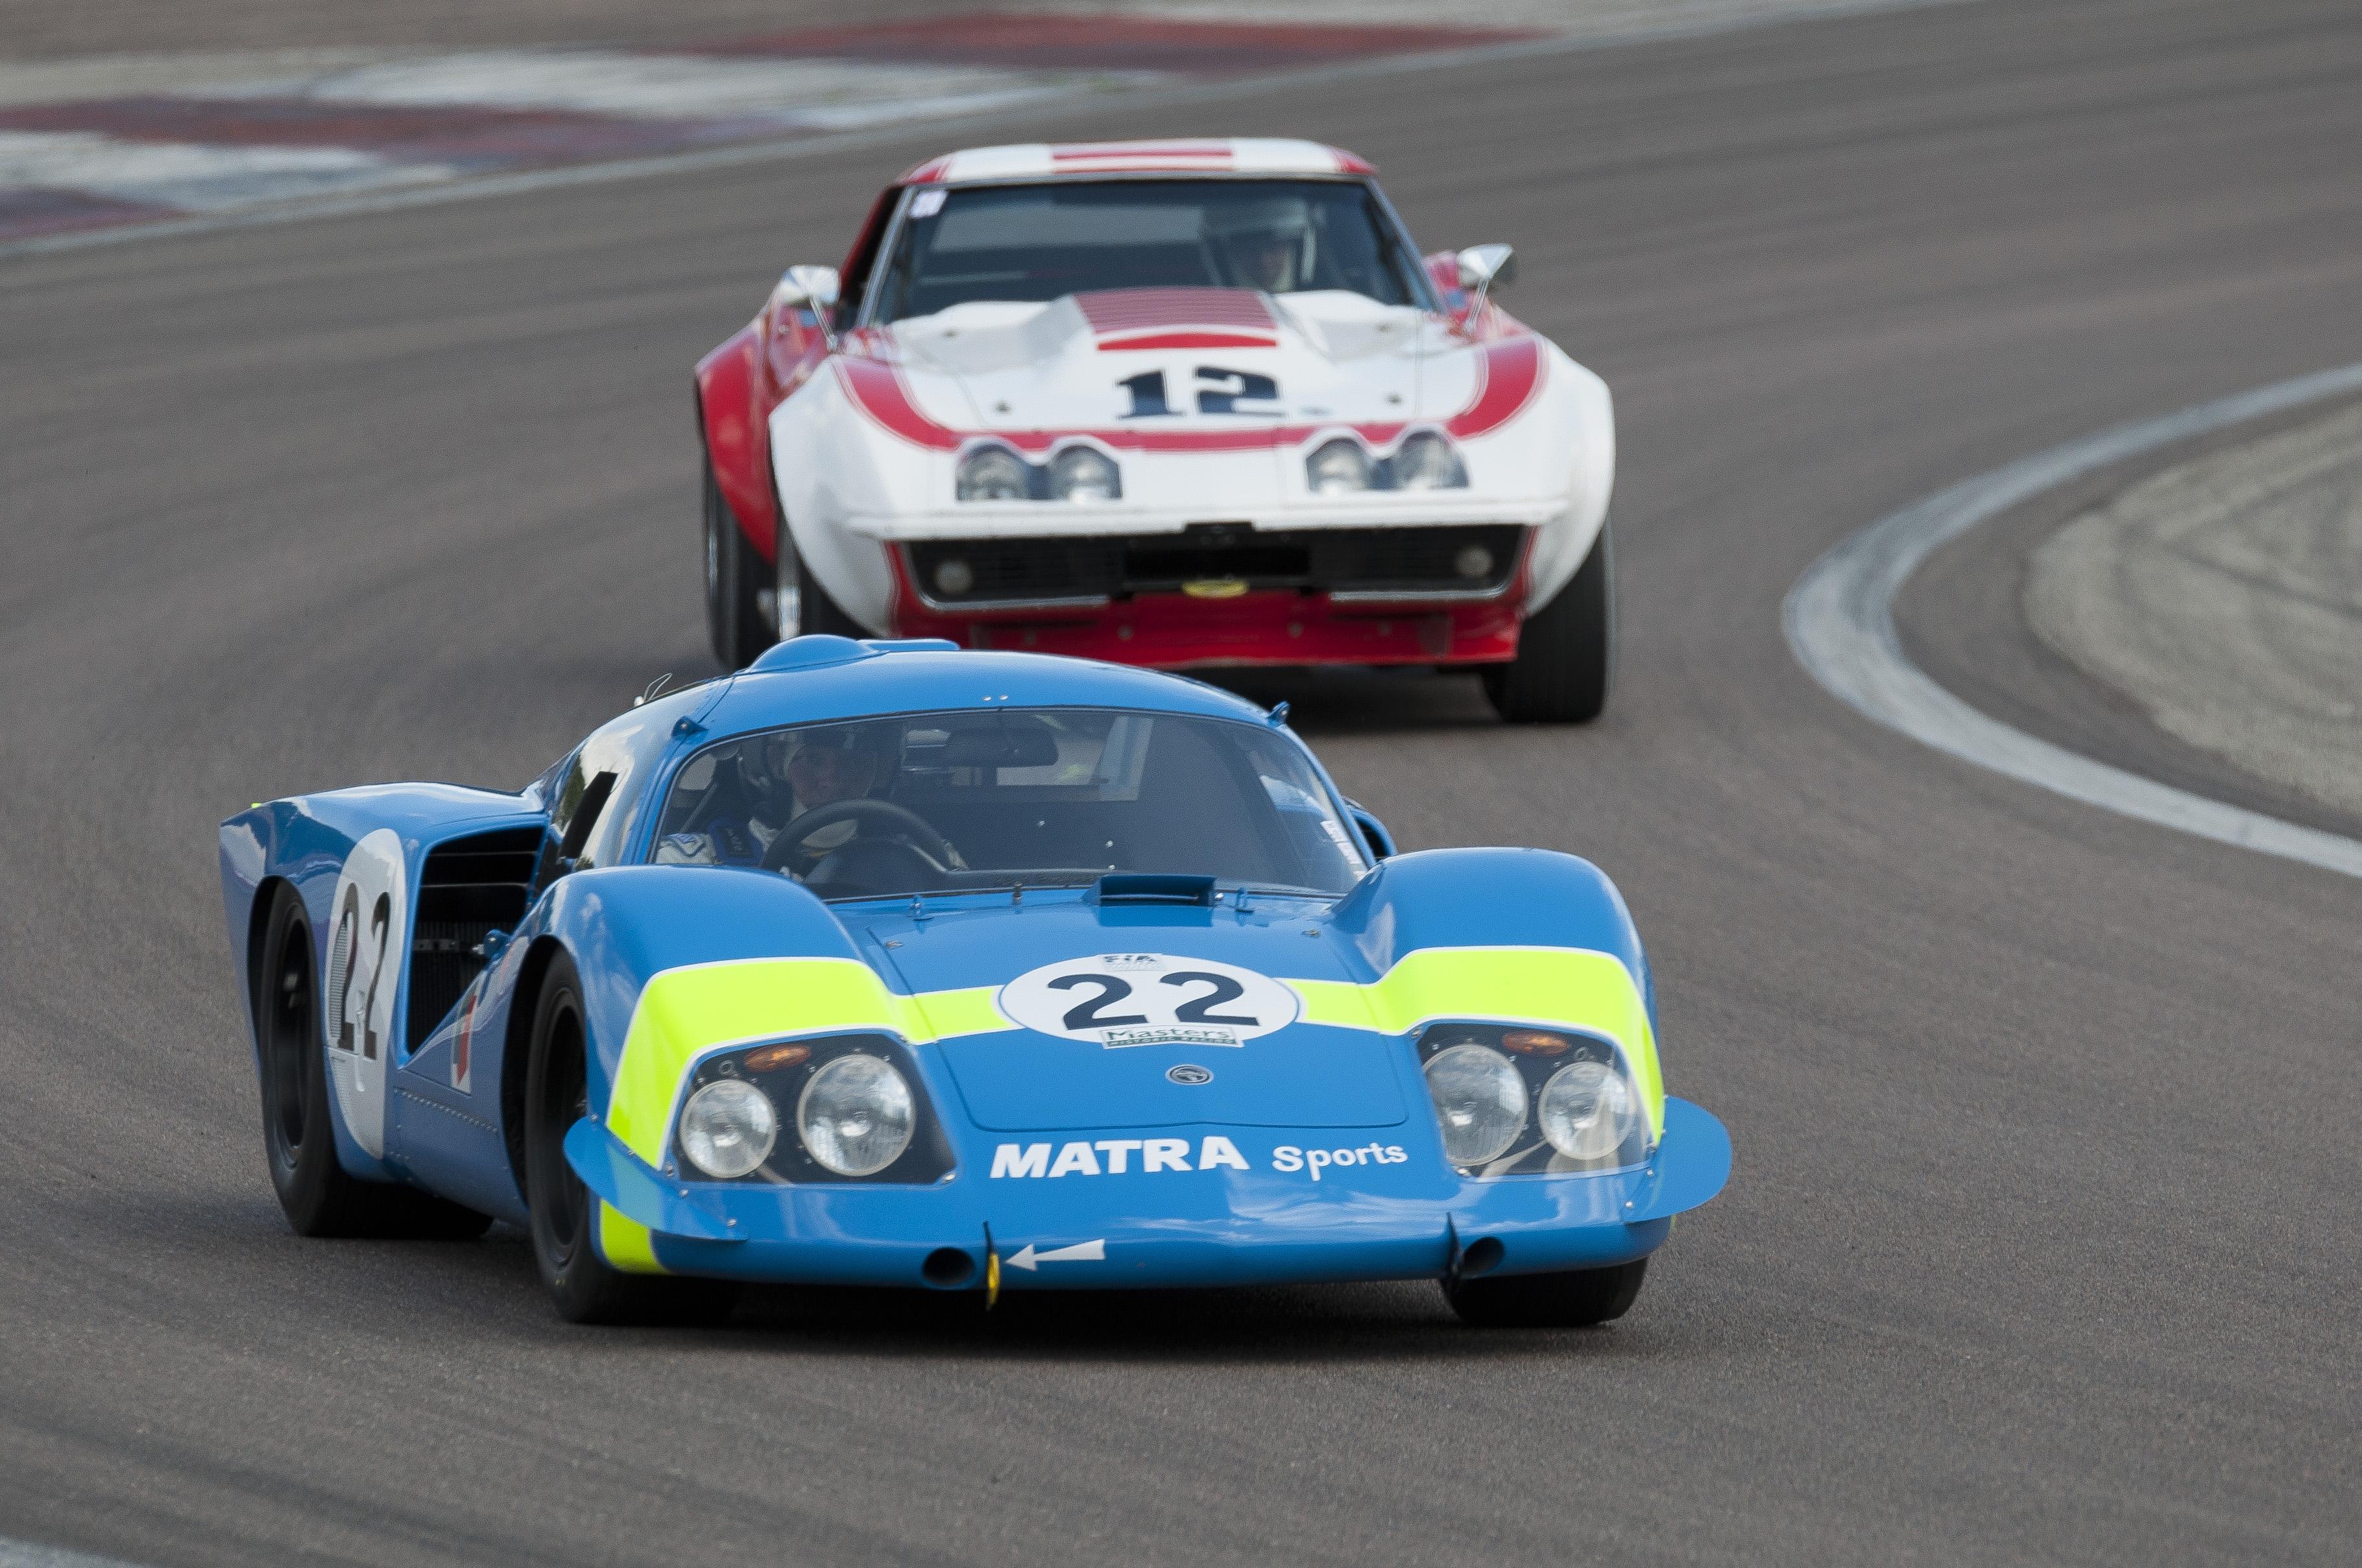 Masters Historic Championships (F1 and Sports Car) - Dijon